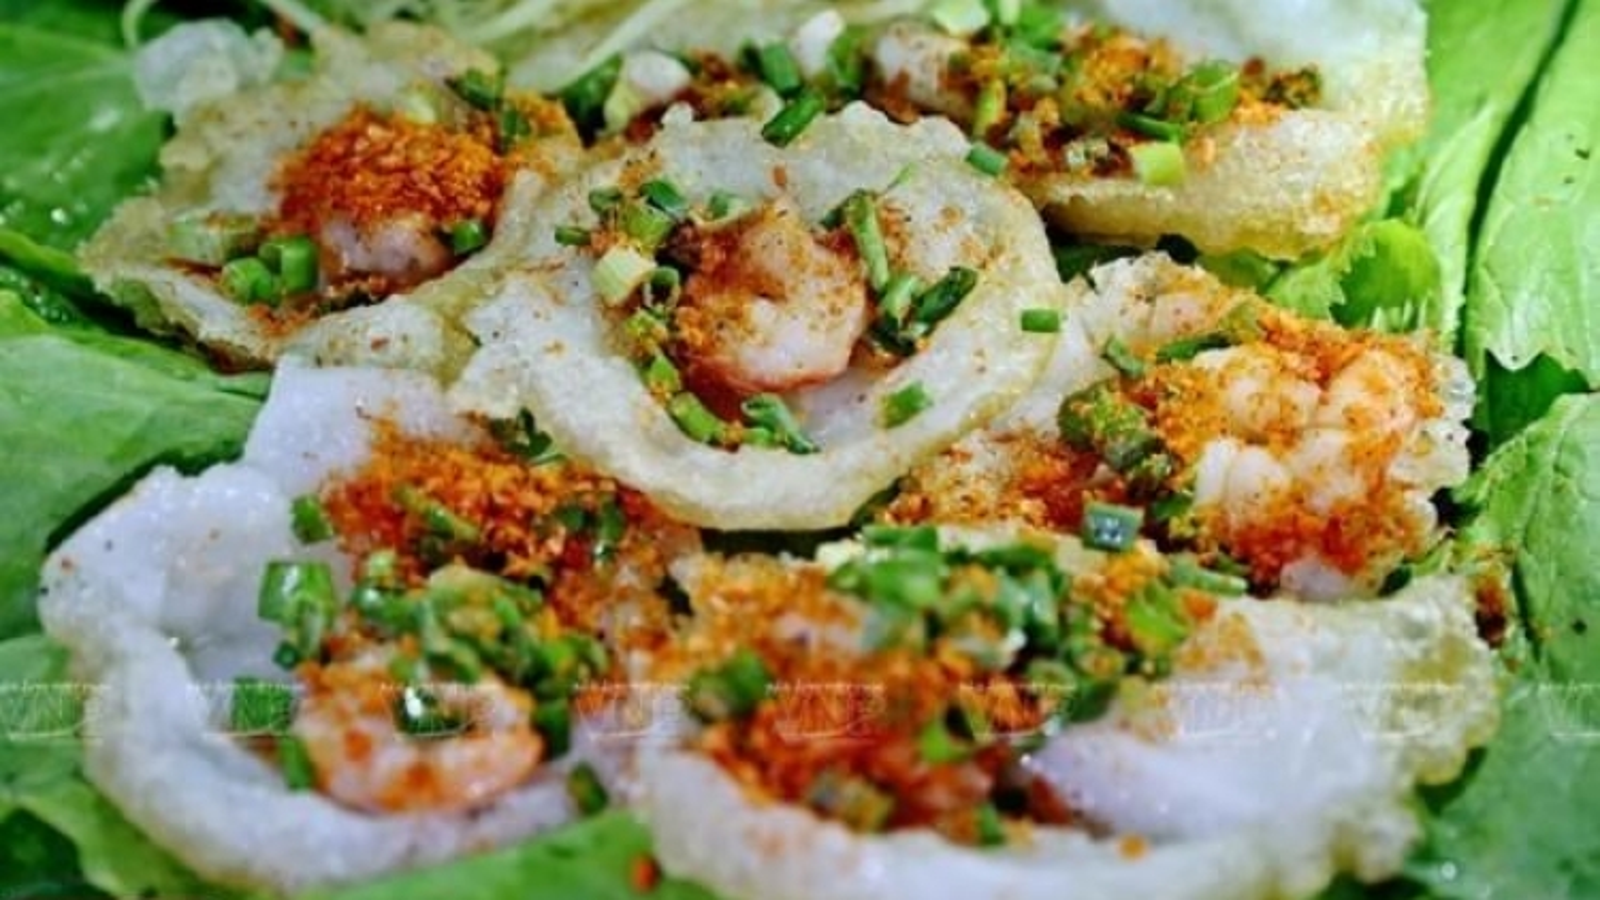 Vung Tau city to host cuisine week